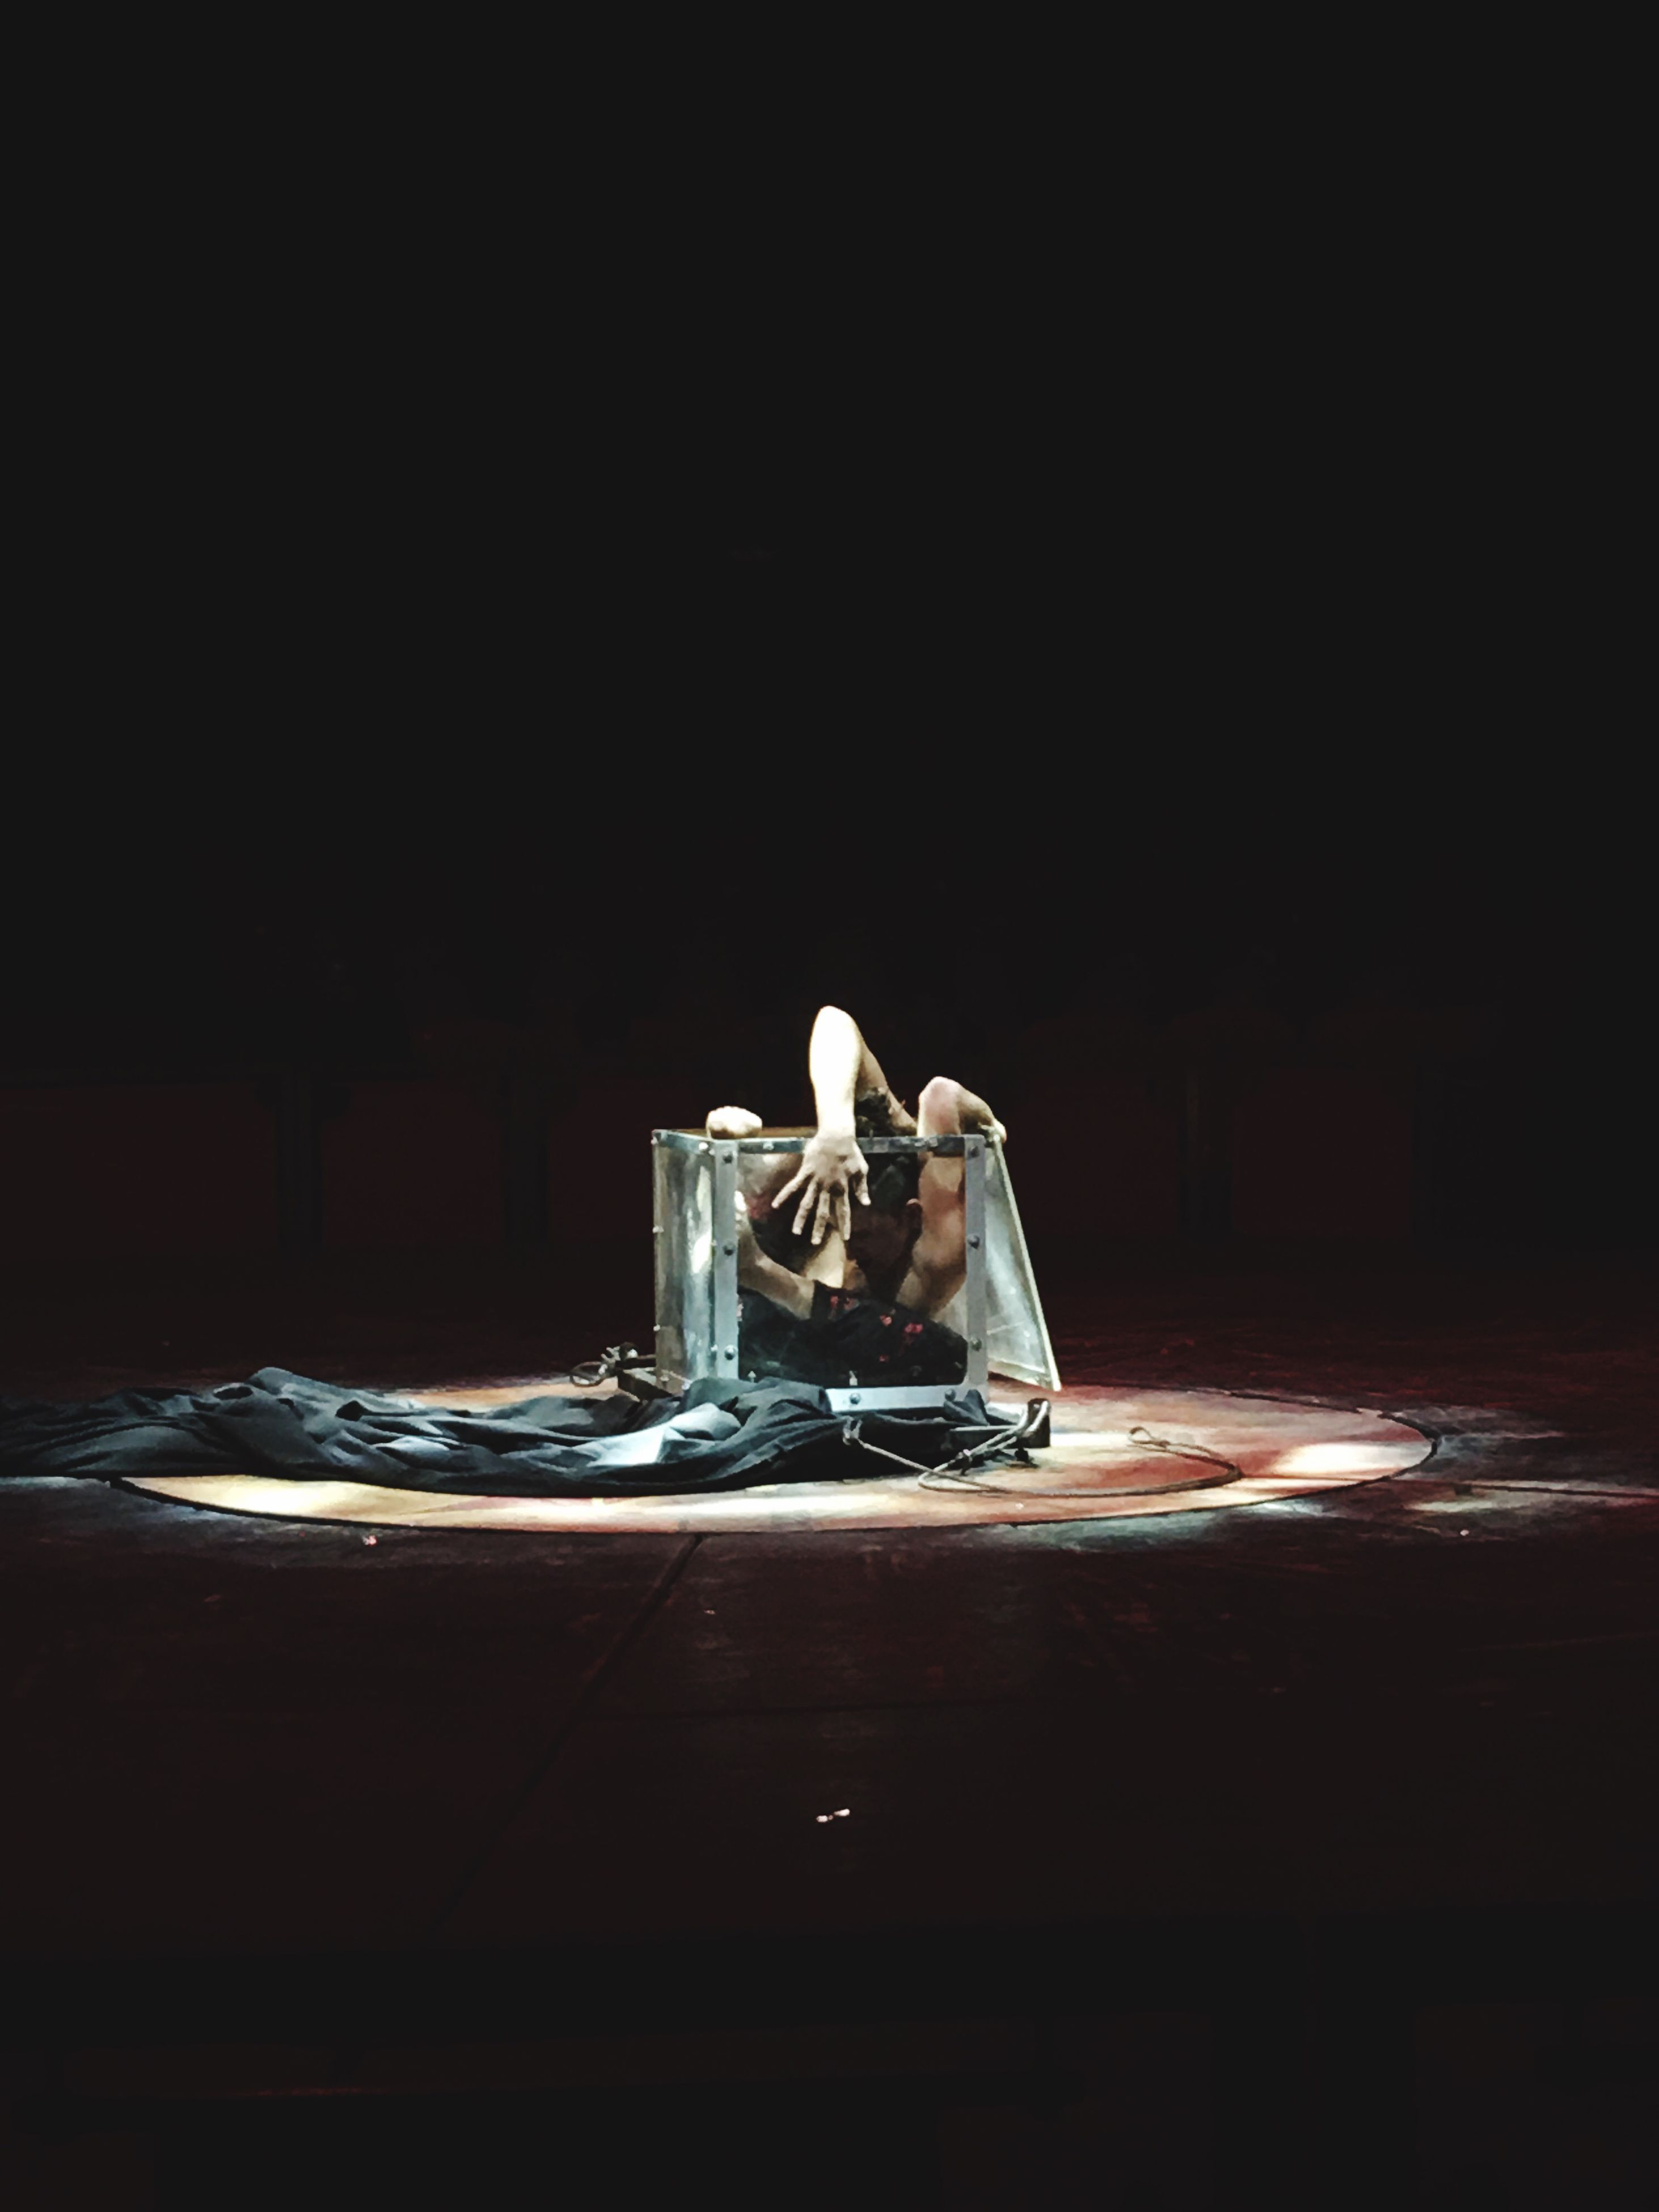 black background, studio shot, no people, pitcher - jug, table, drink, indoors, crumpled paper